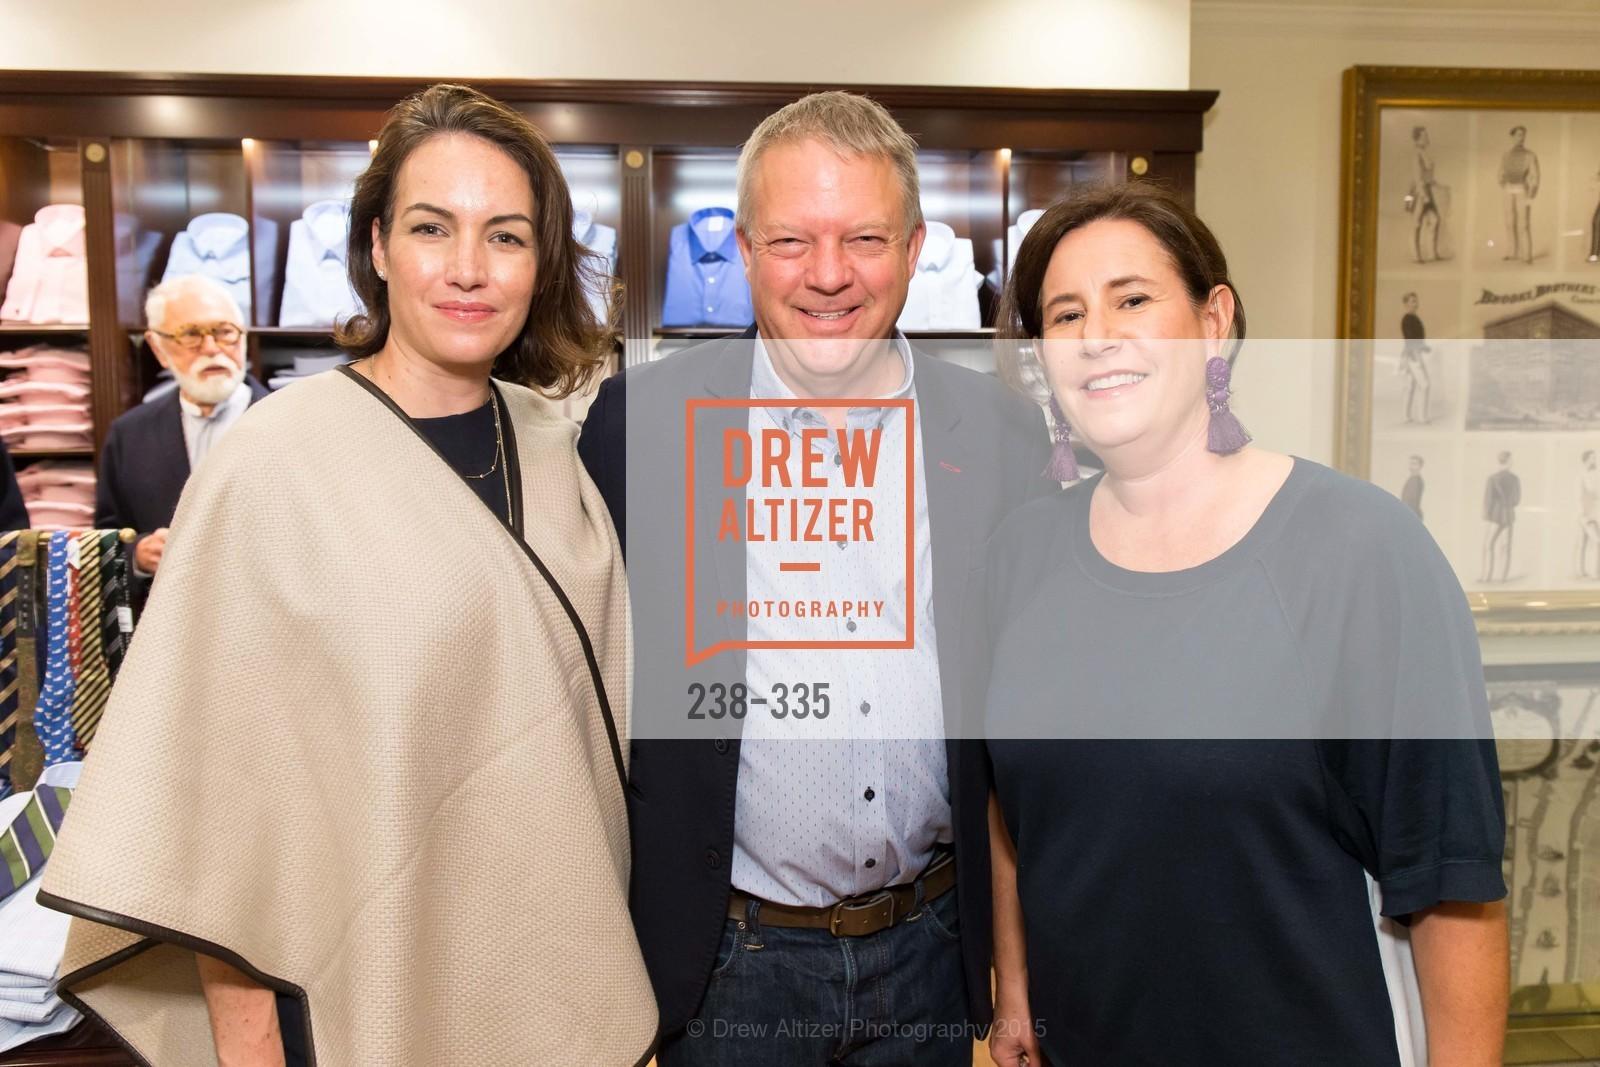 Krista Coupar, David Livingston, Hilary Sessions, Photo #238-335